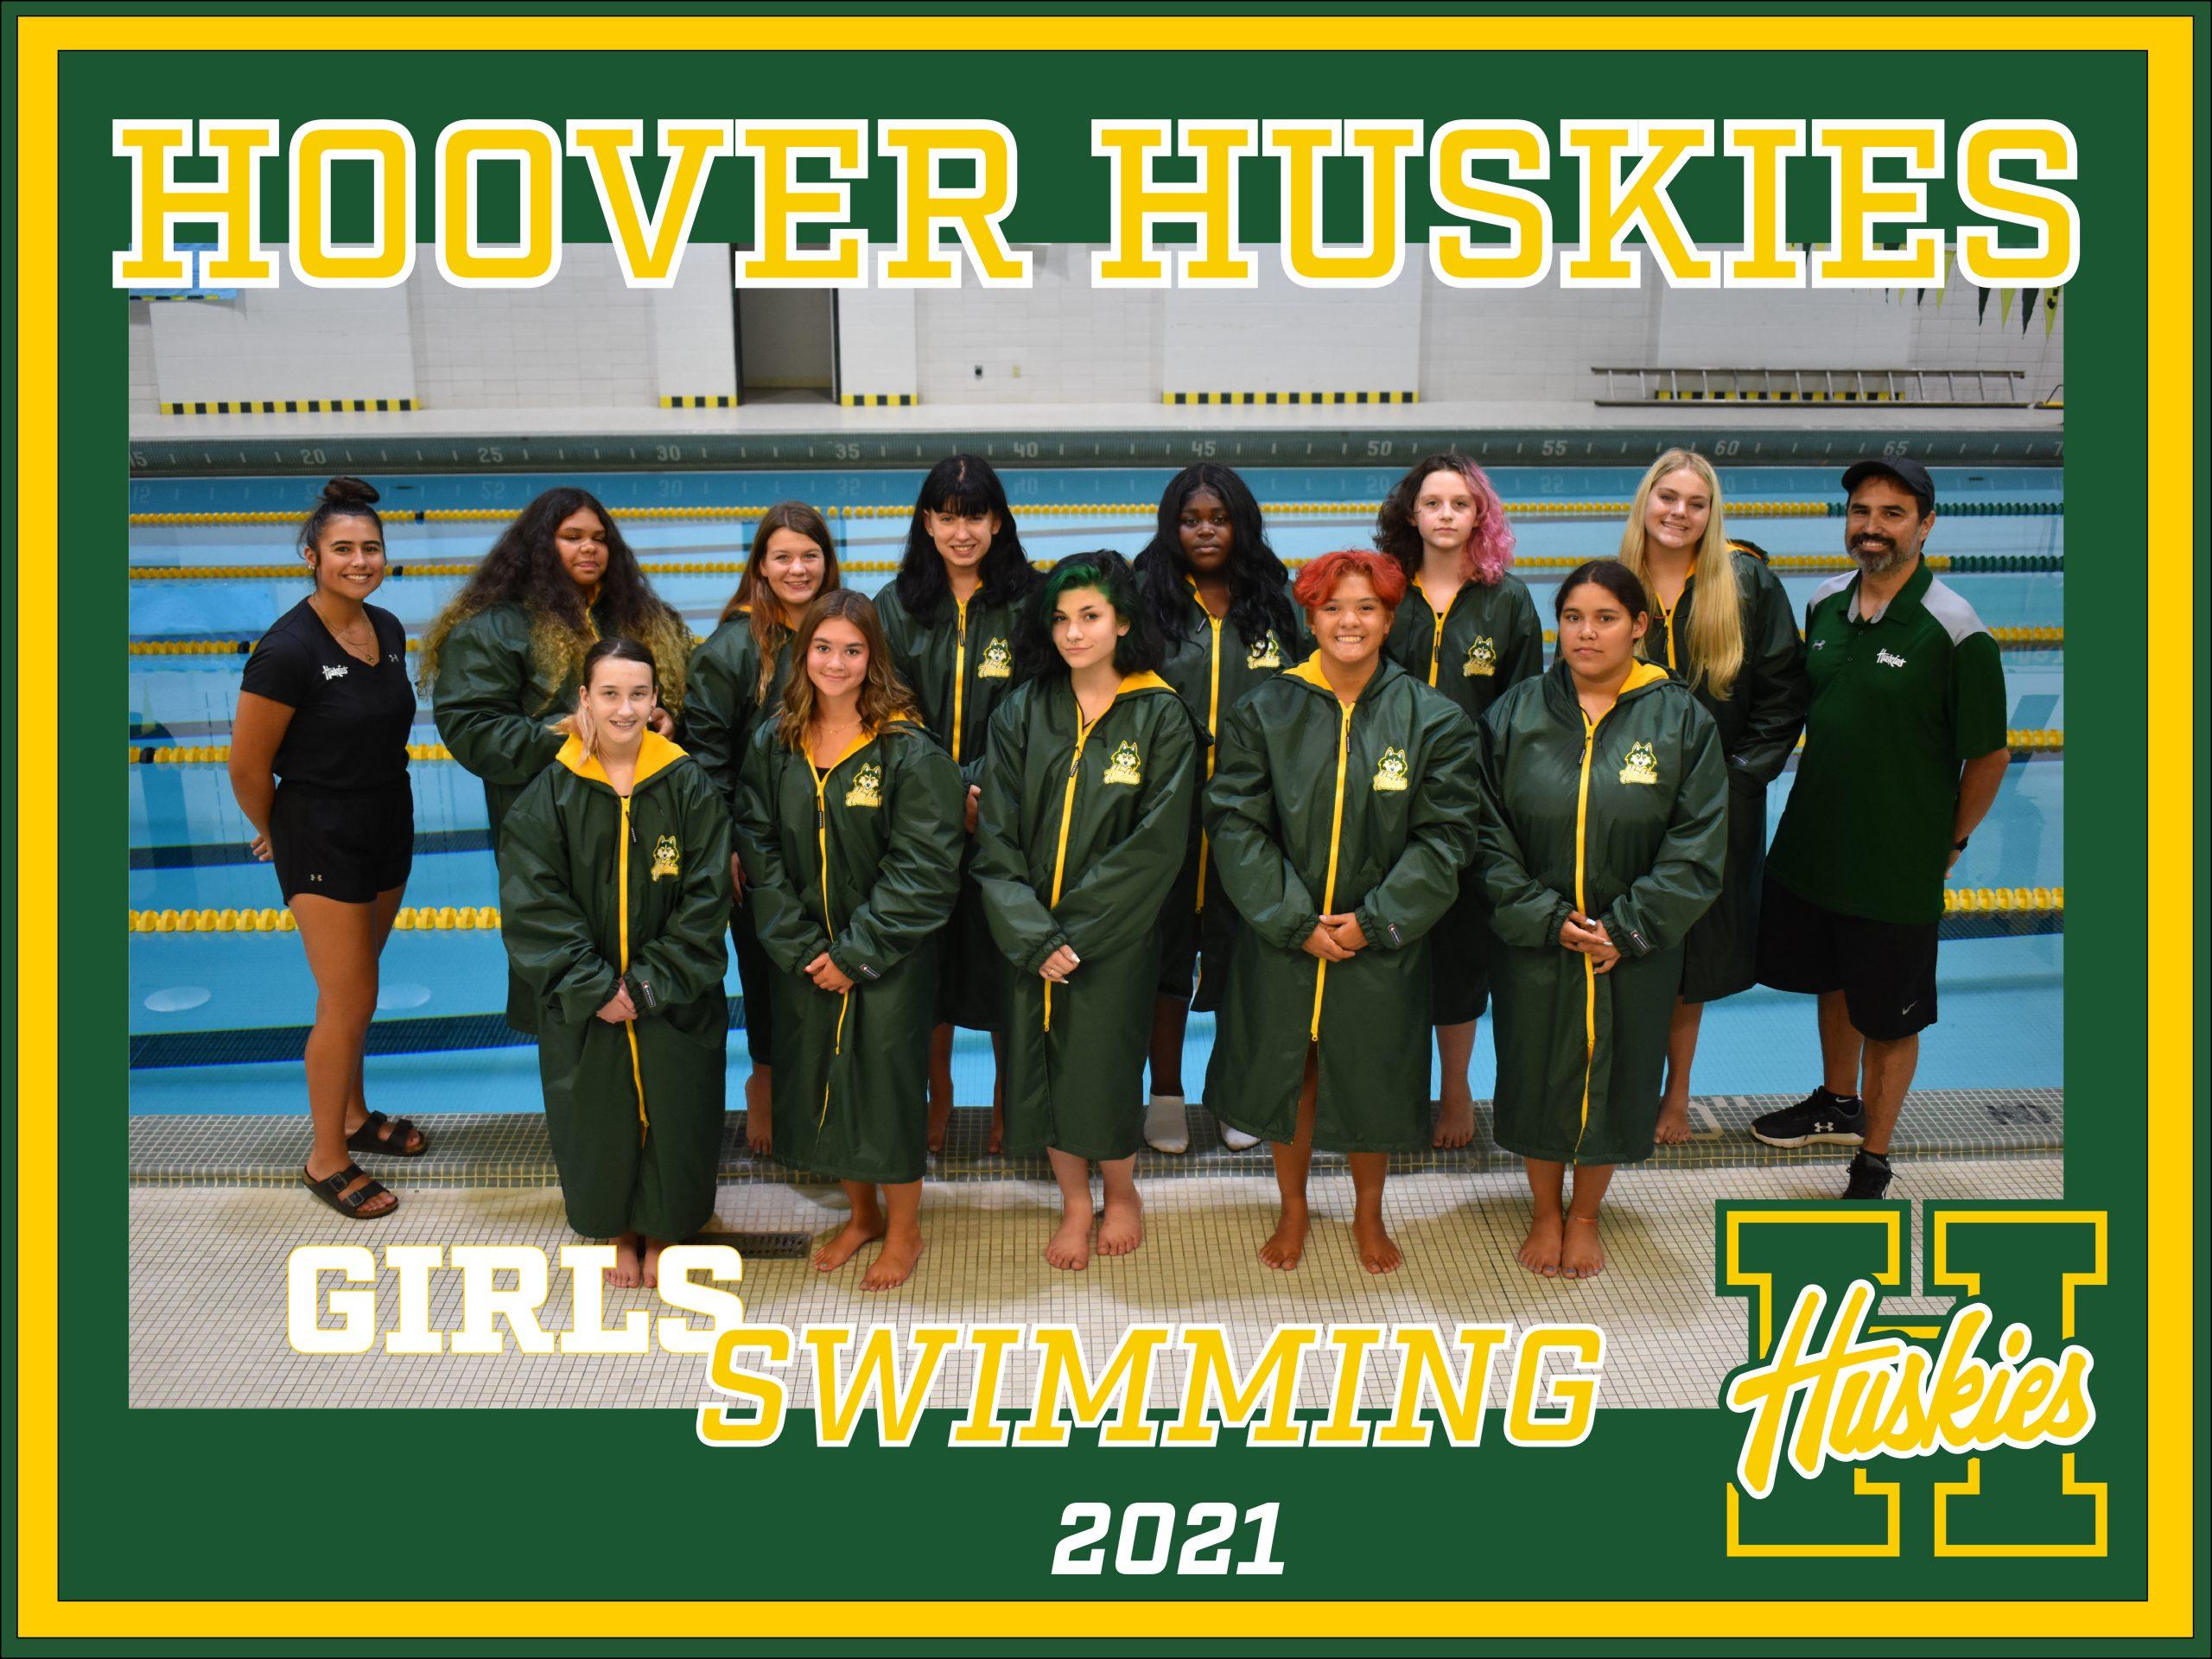 Hoover GIRLS SWIMMING POSTER 2021